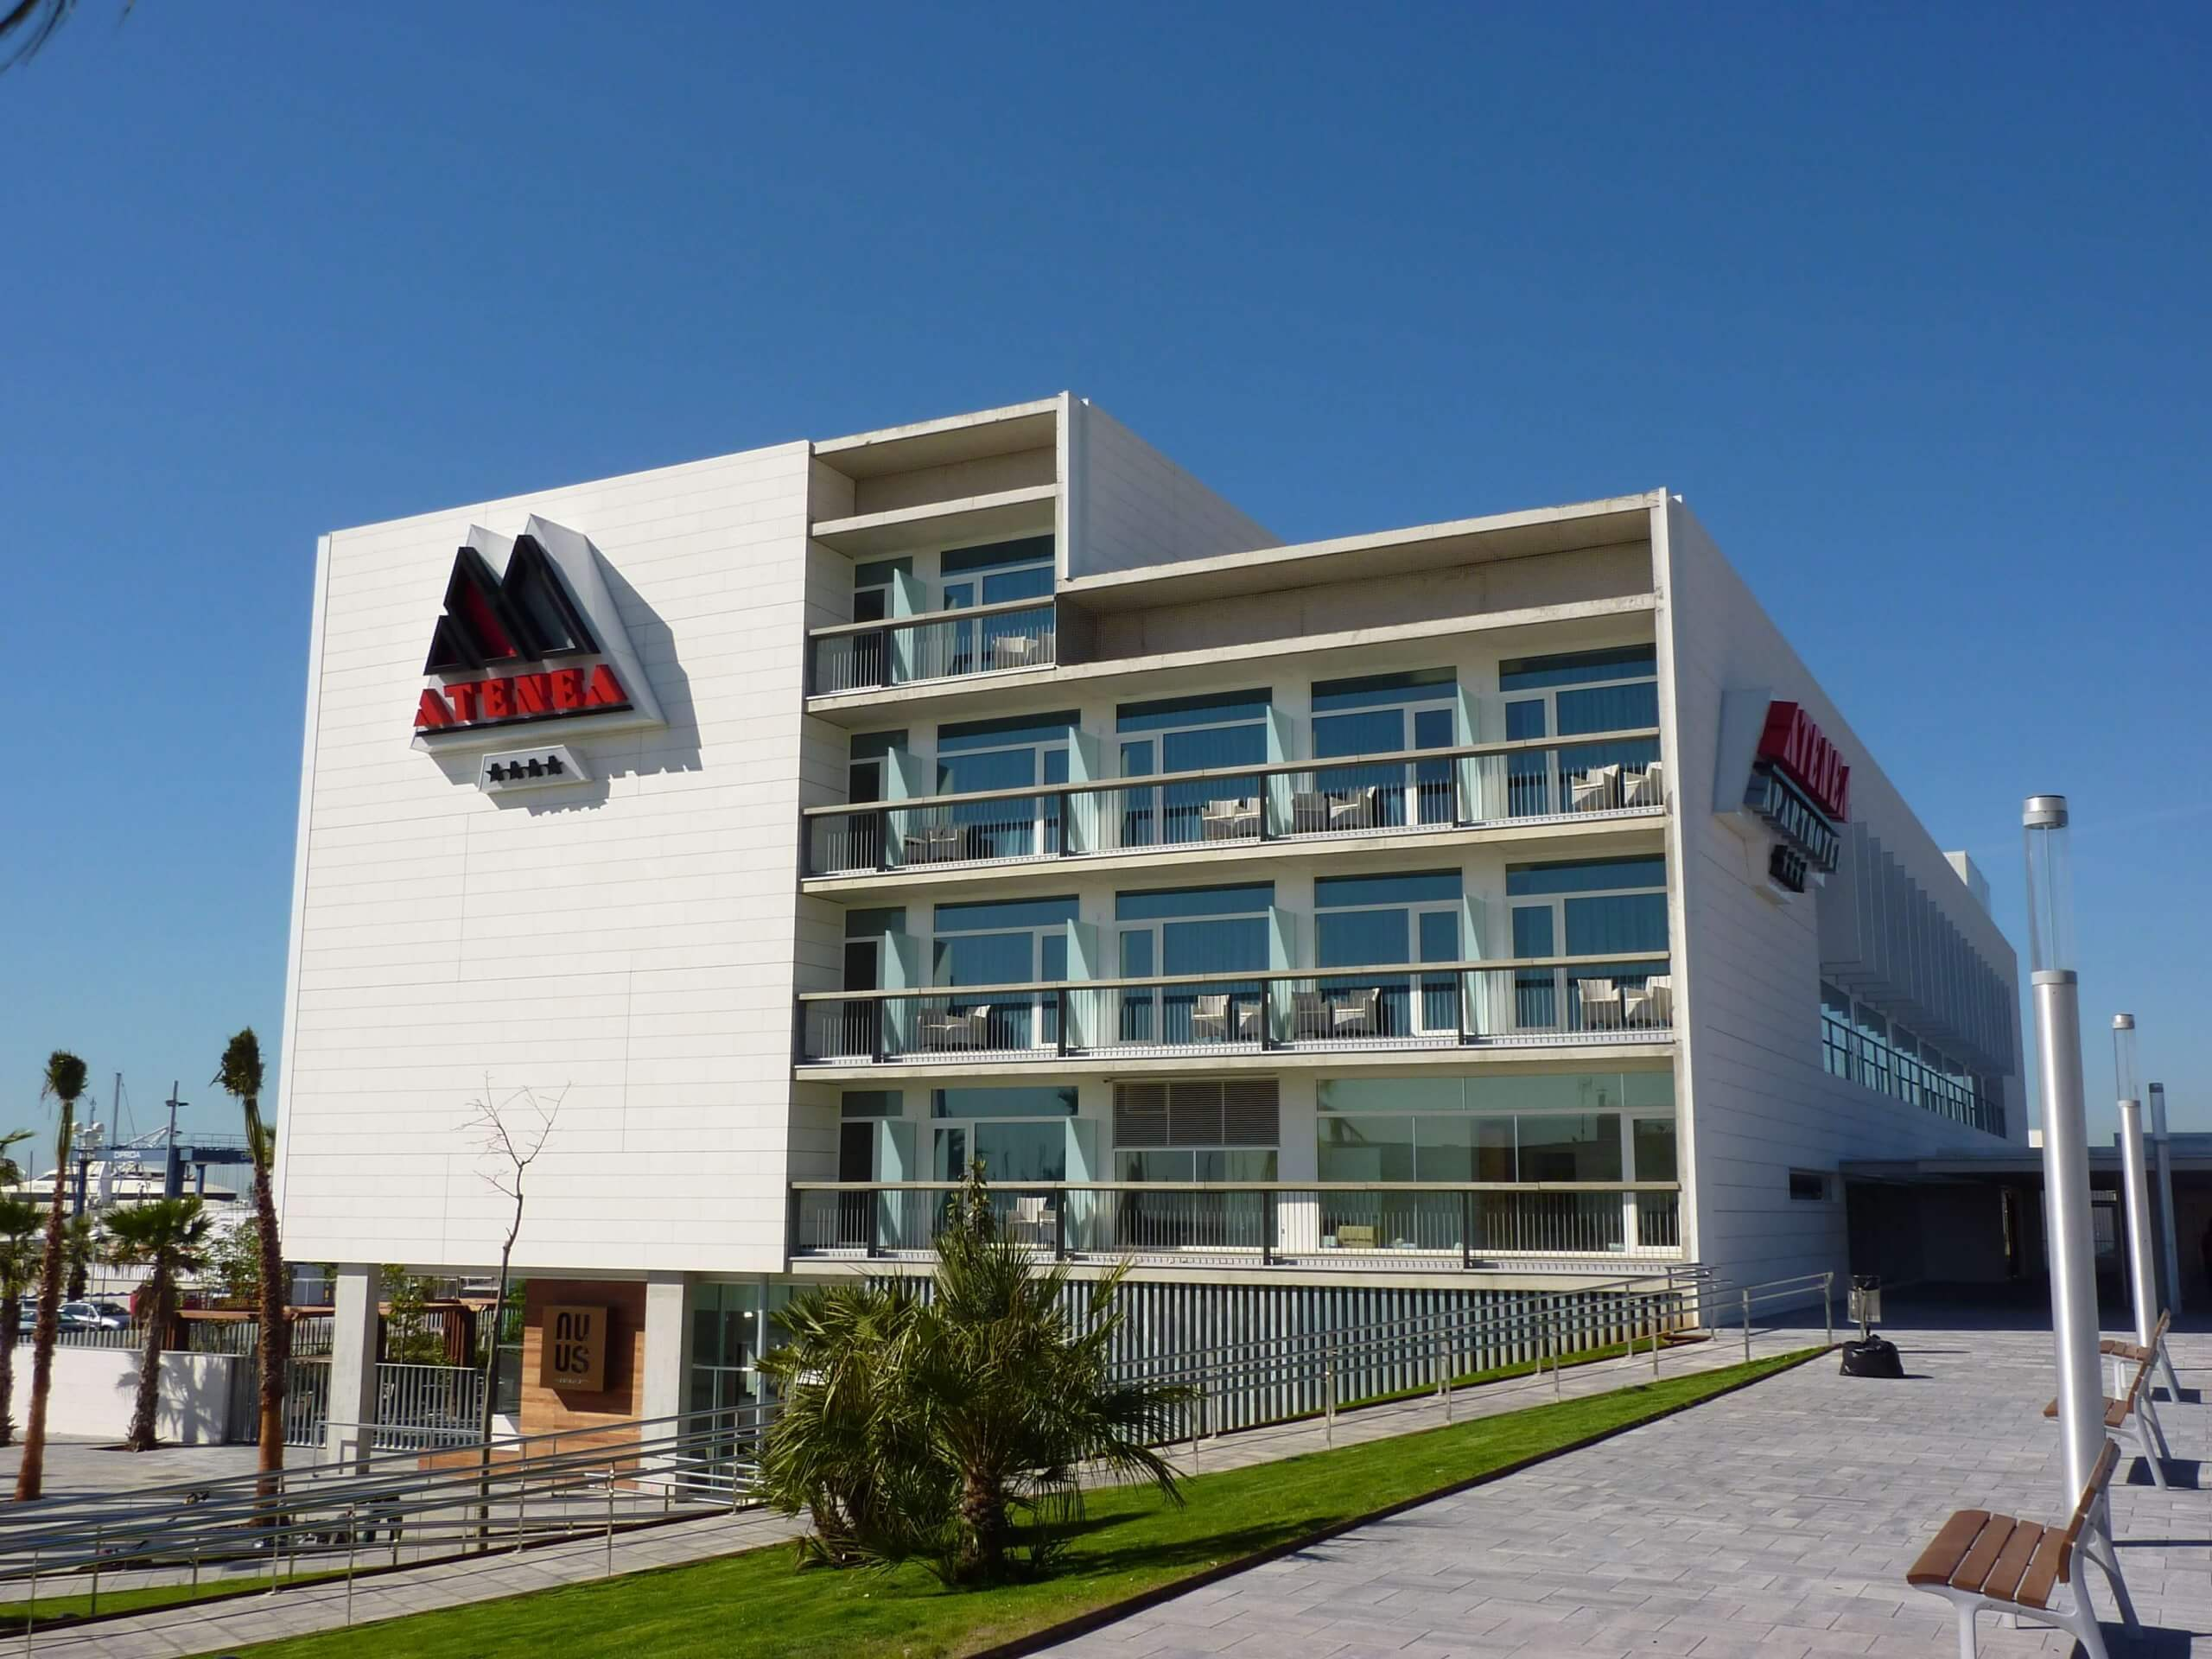 Hotel Atenea Mataró